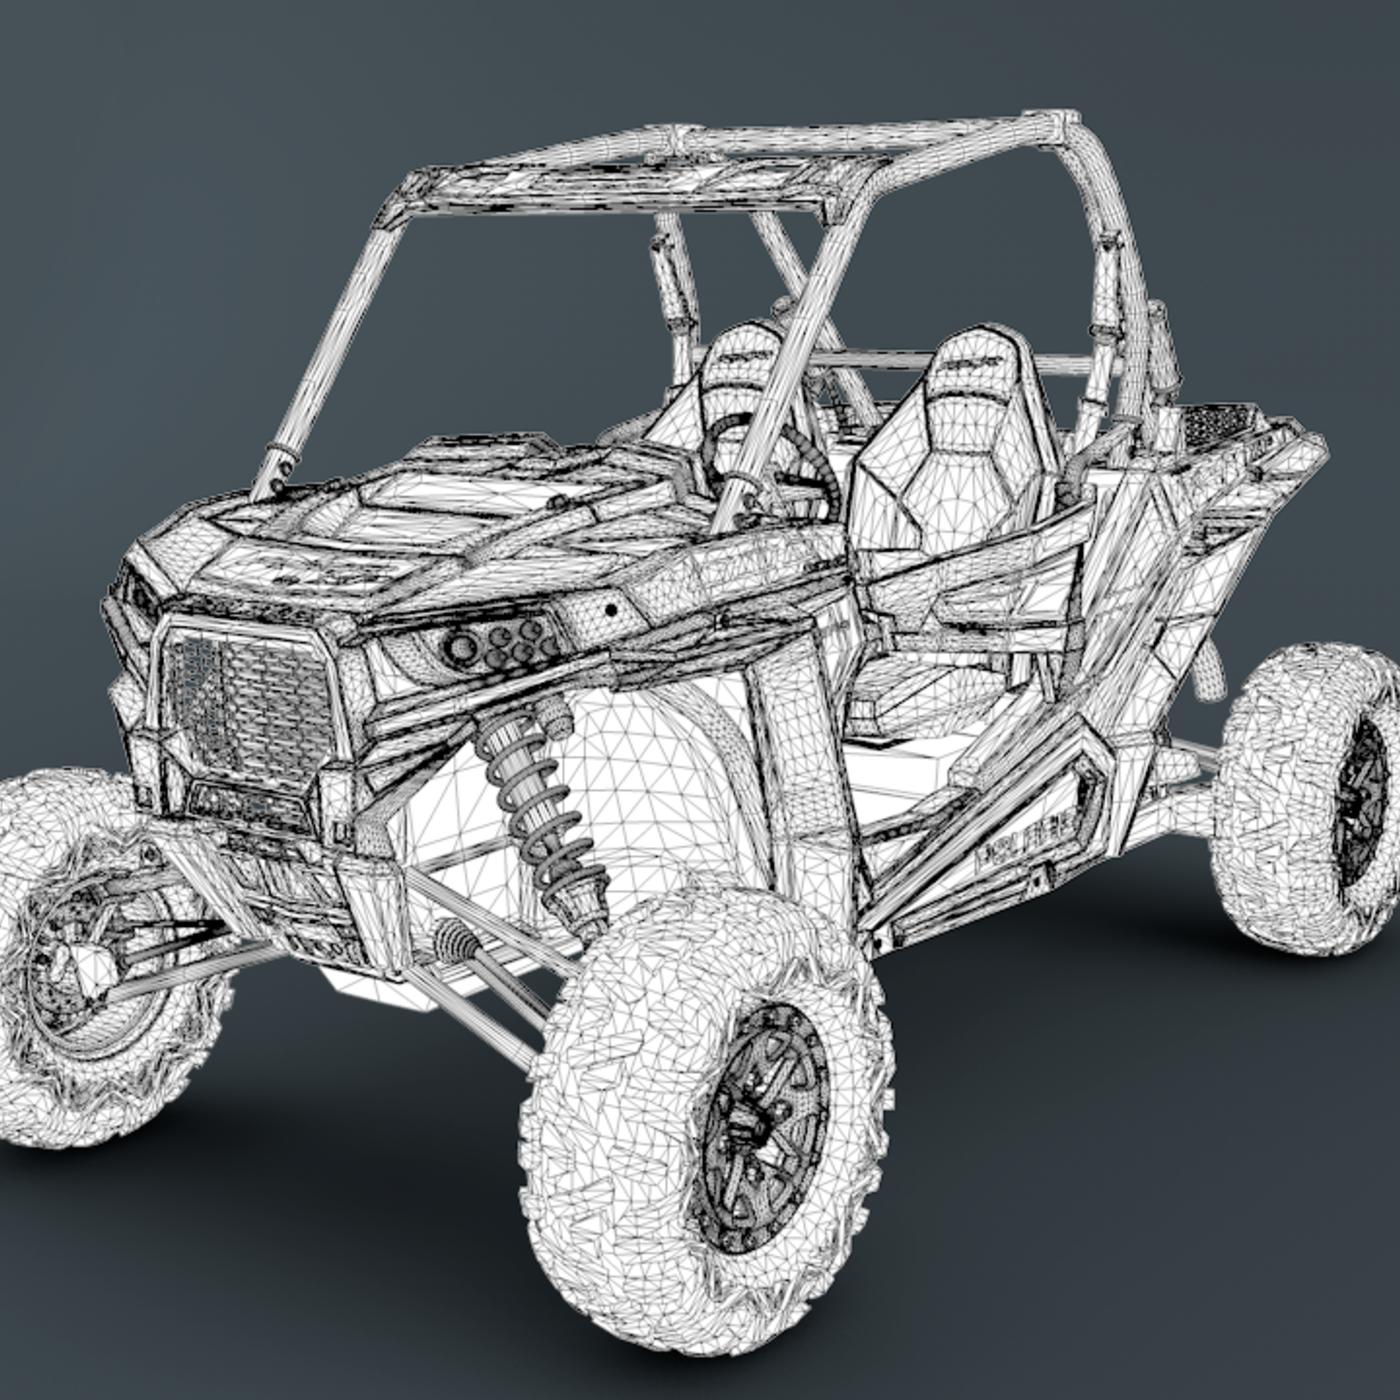 Polaris Ranger RZR 1000 Blue Version